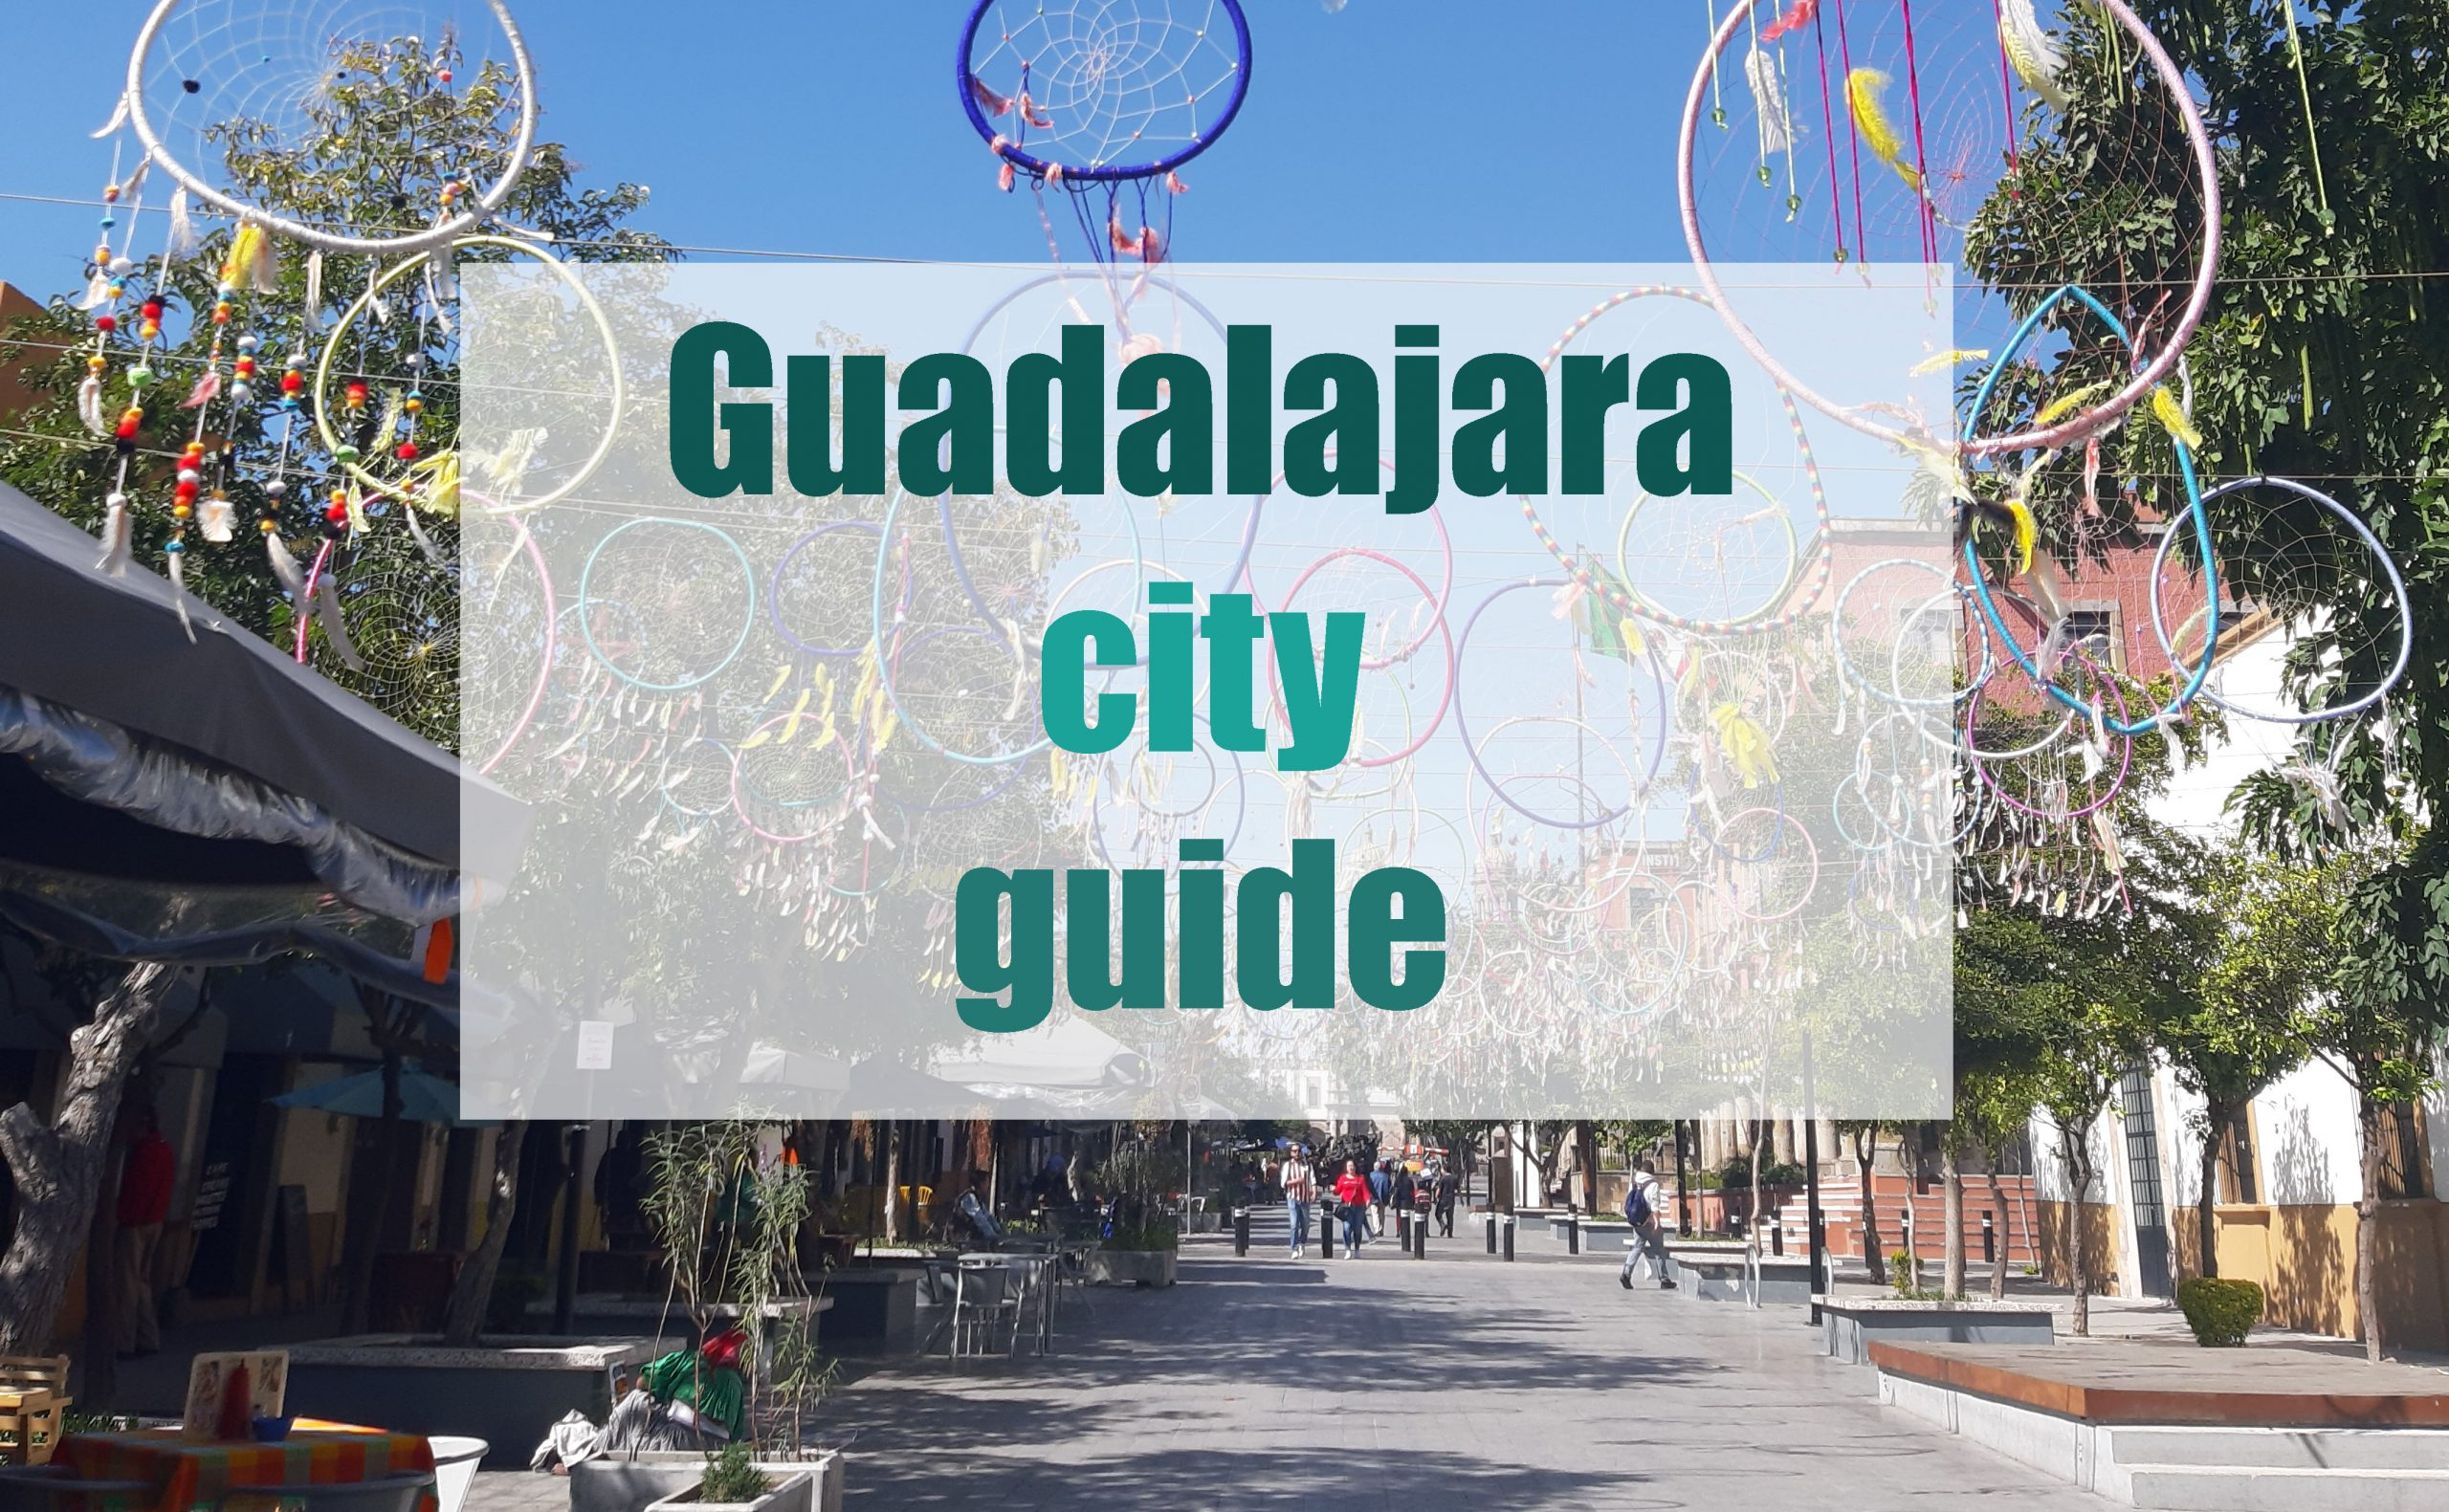 Guadalajara city guide Mexico